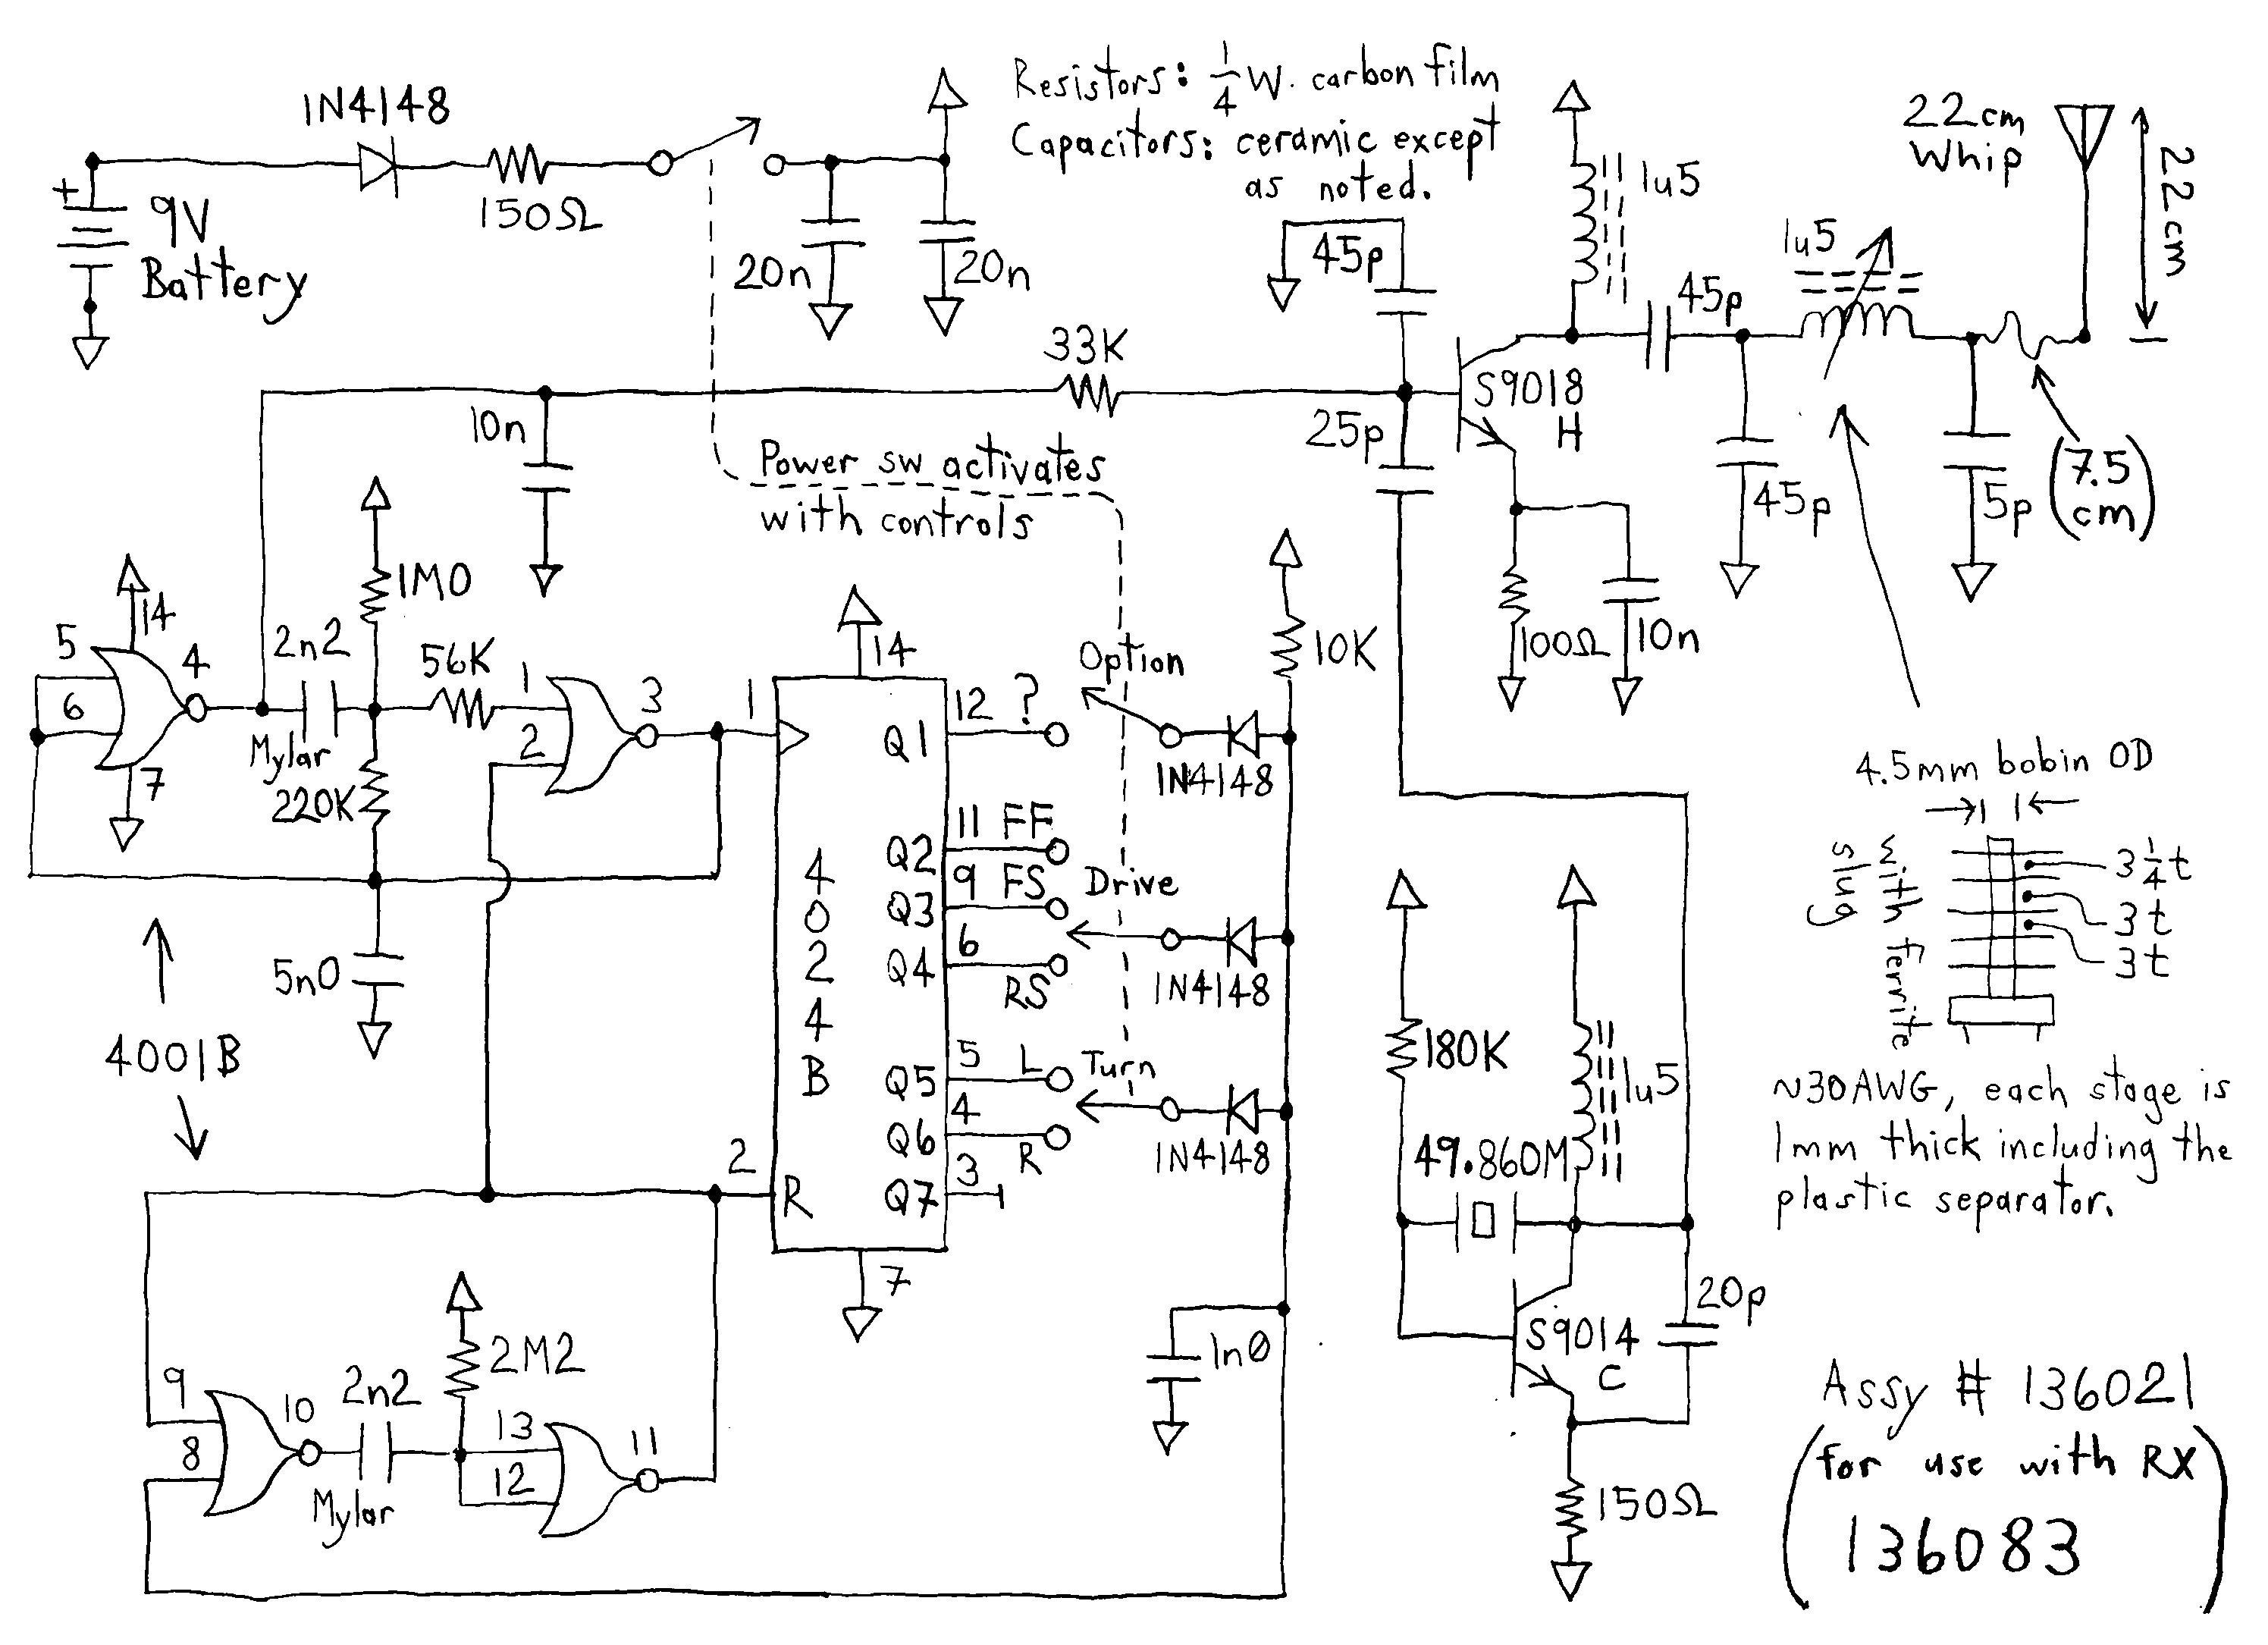 Remote Control Circuit Diagram for toy Car Electric toy Car Wiring Diagram Of Remote Control Circuit Diagram for toy Car